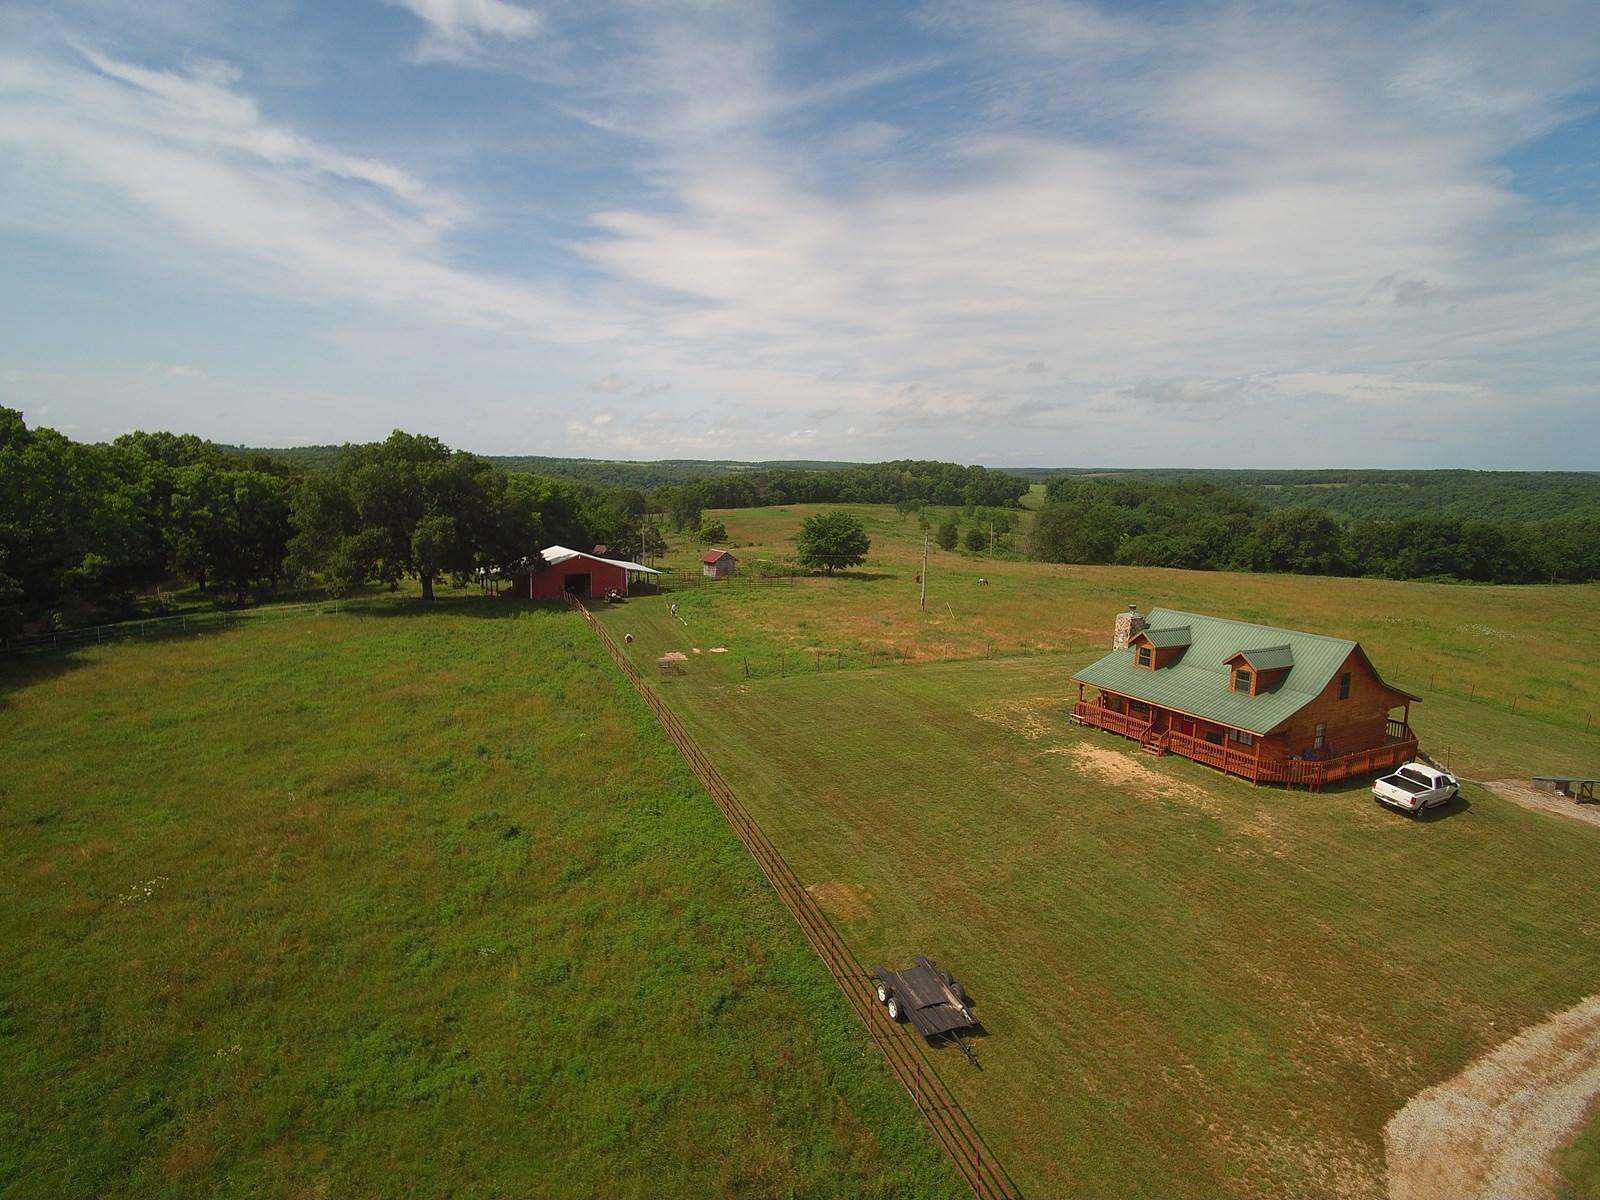 85 Acre Farm for Sale in Douglas County, Cedar Log Home